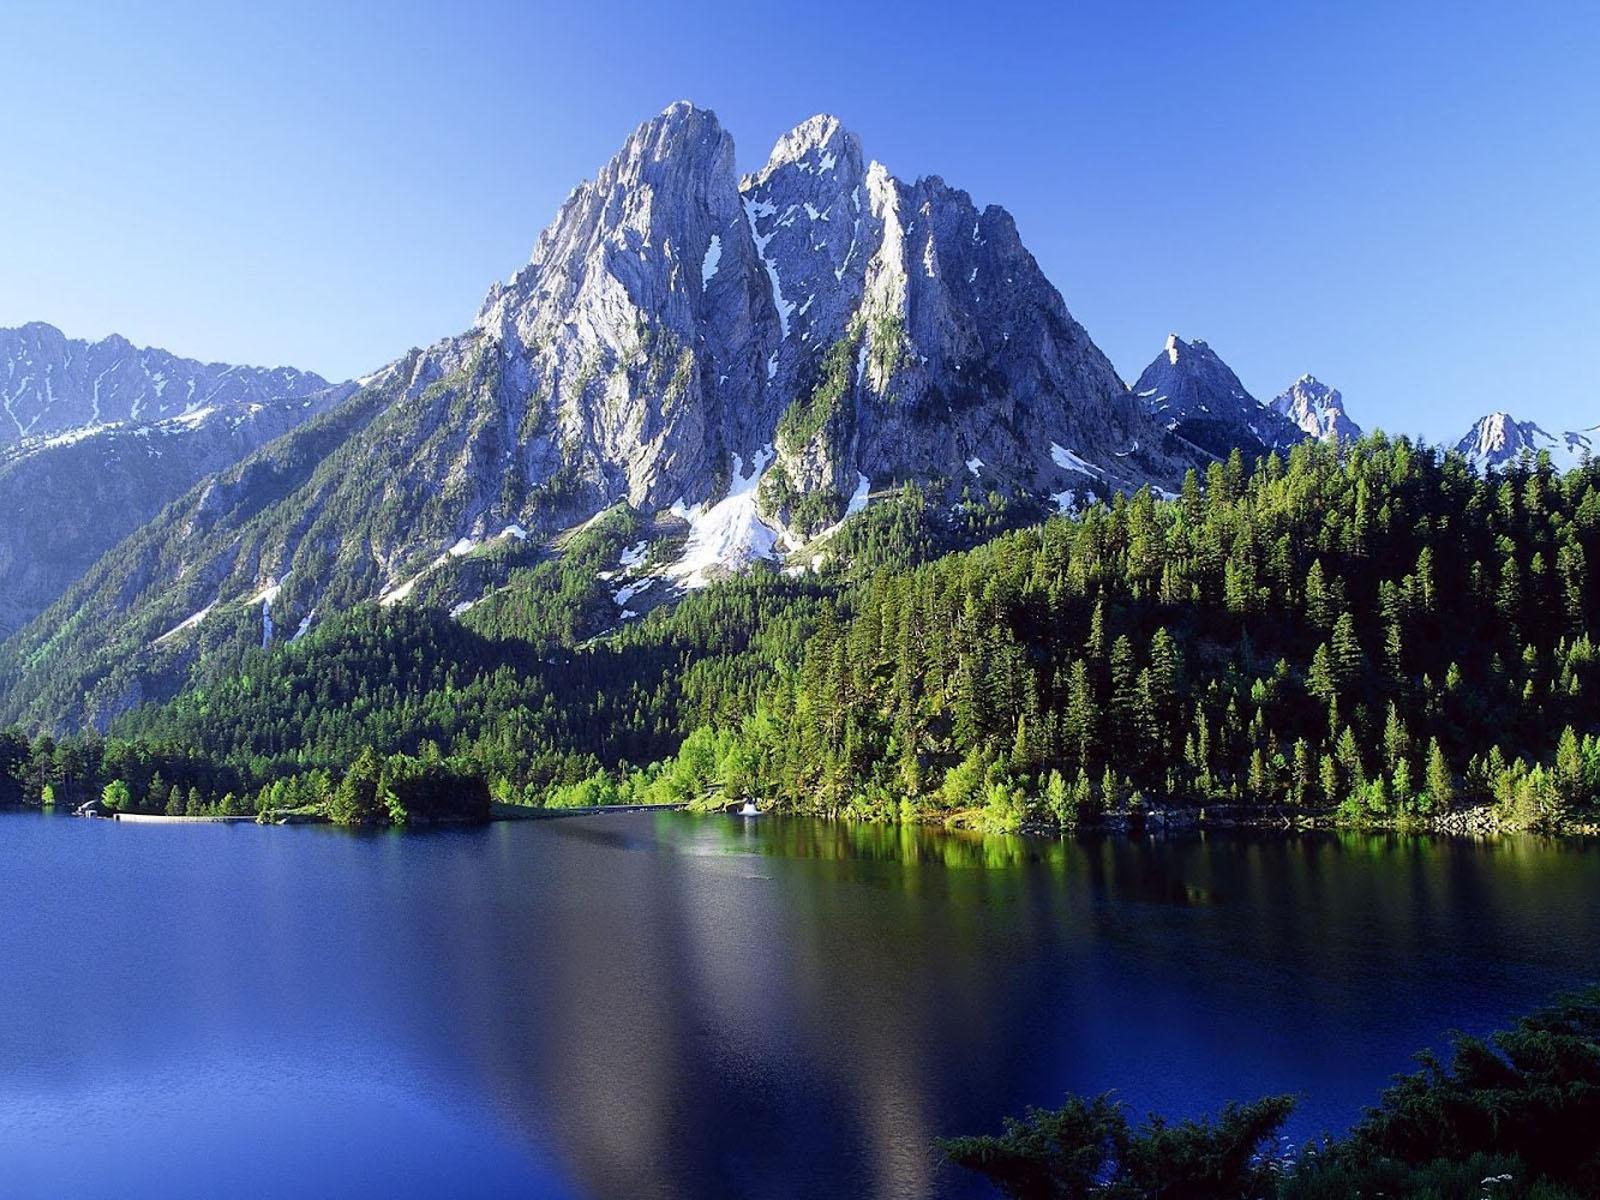 Hd Wallpaper High Resolution Mountains Wallpapers